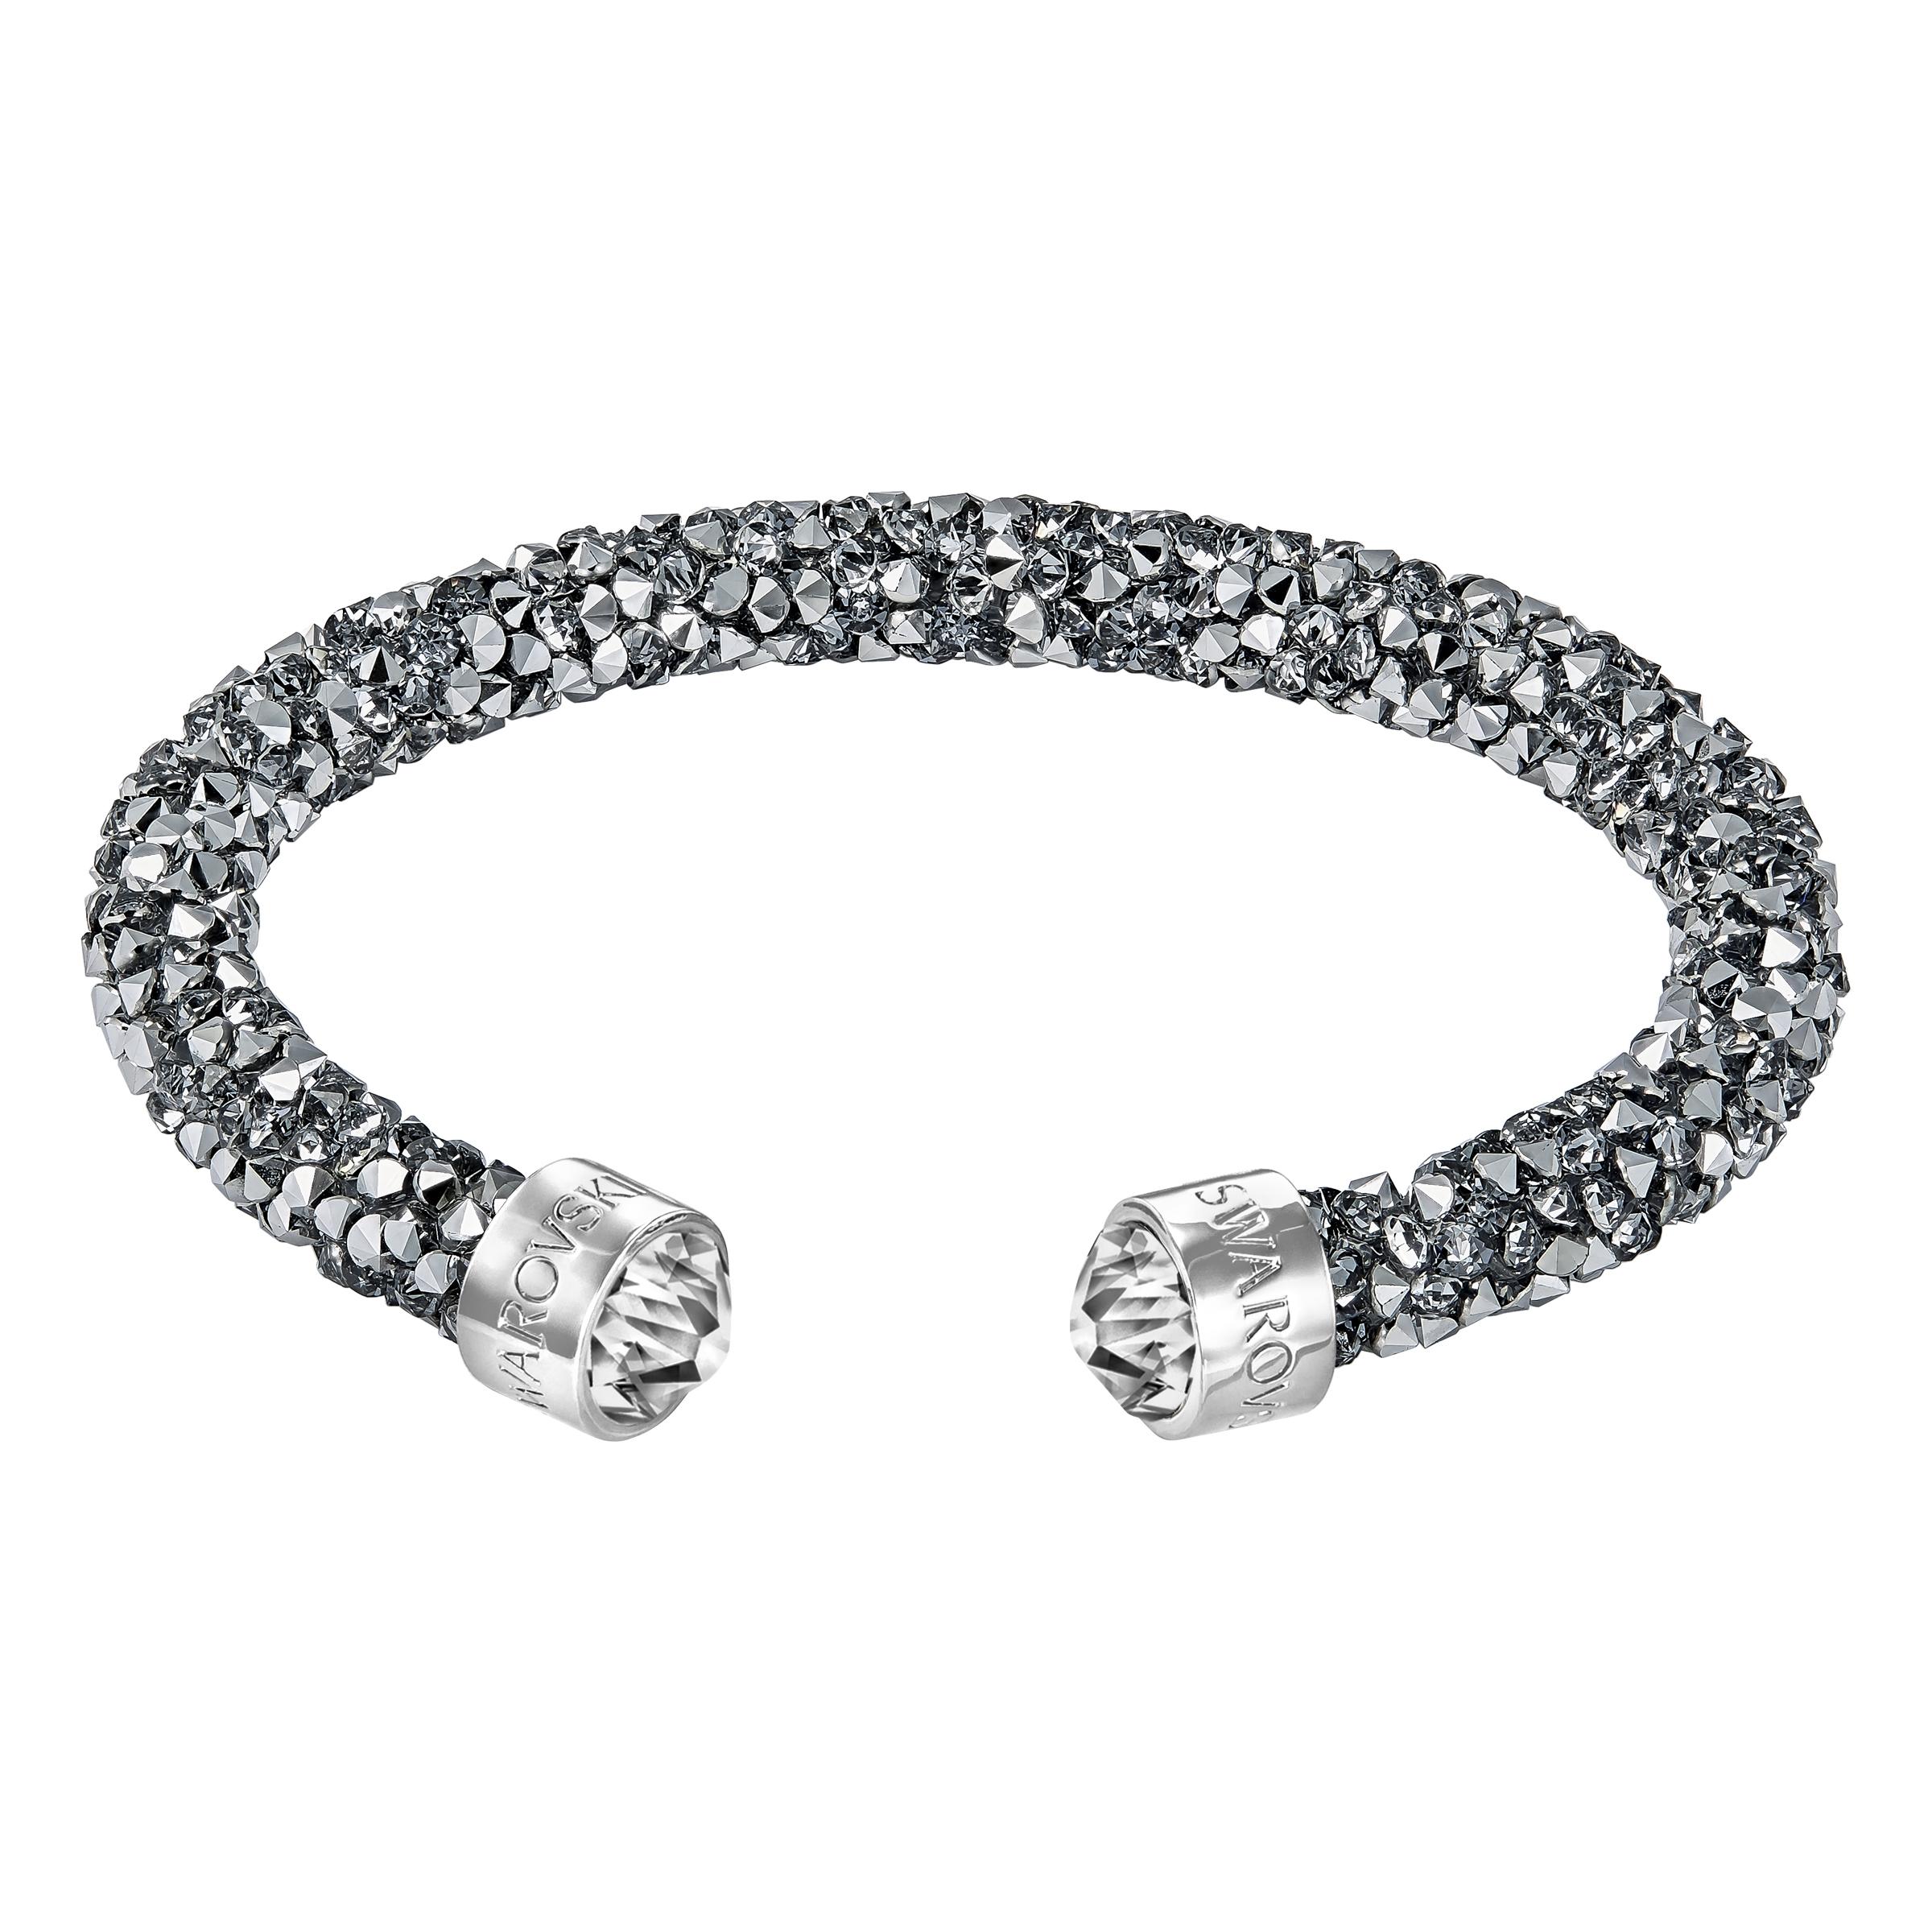 Manchette Swarovski Crystaldust, gris, acier inoxydable